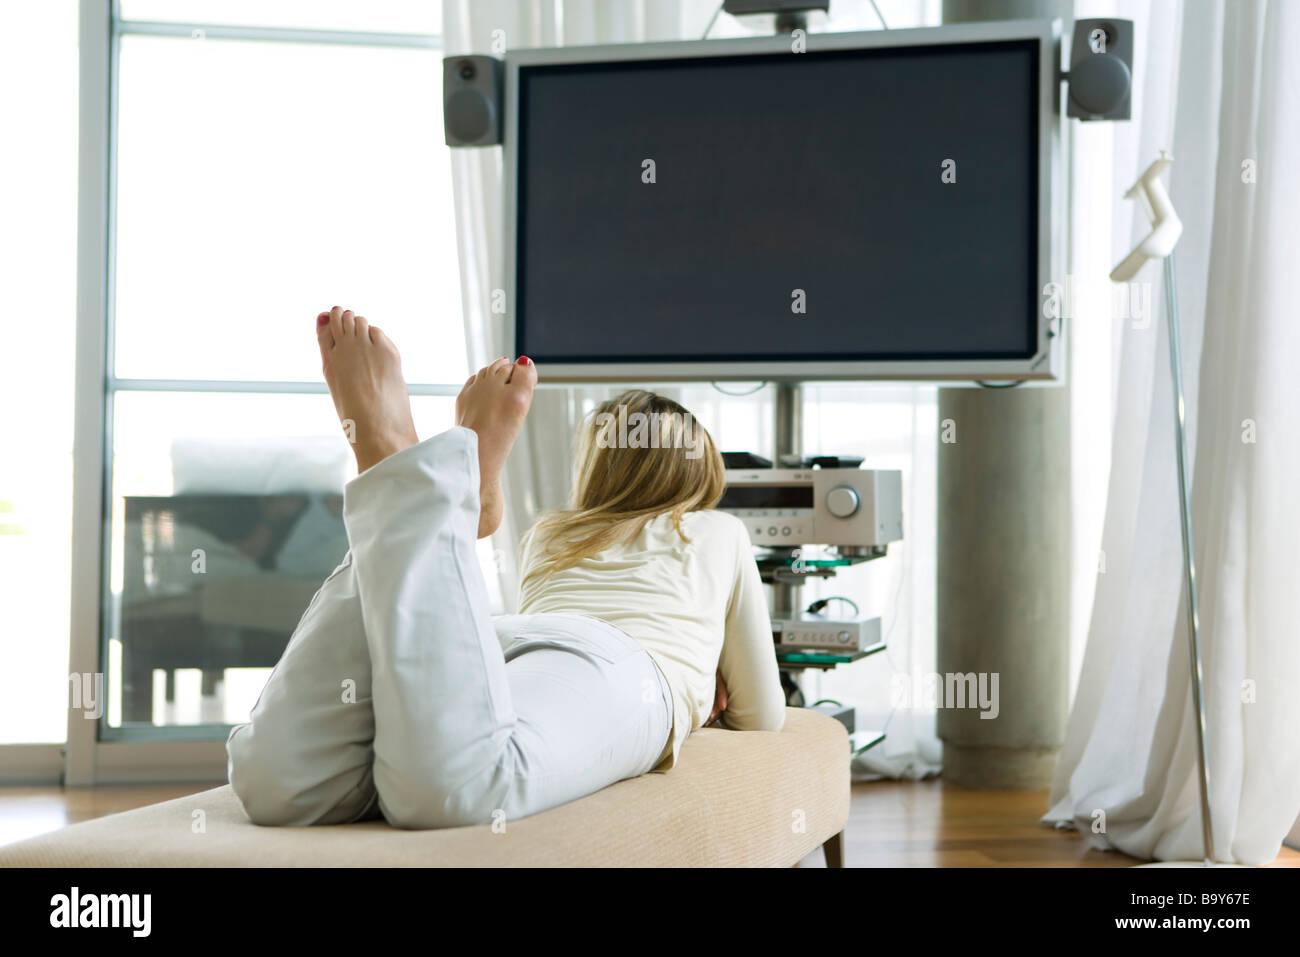 Frau liegend auf Bauch vor dem Flachbild-Fernseher, Rückansicht Stockbild